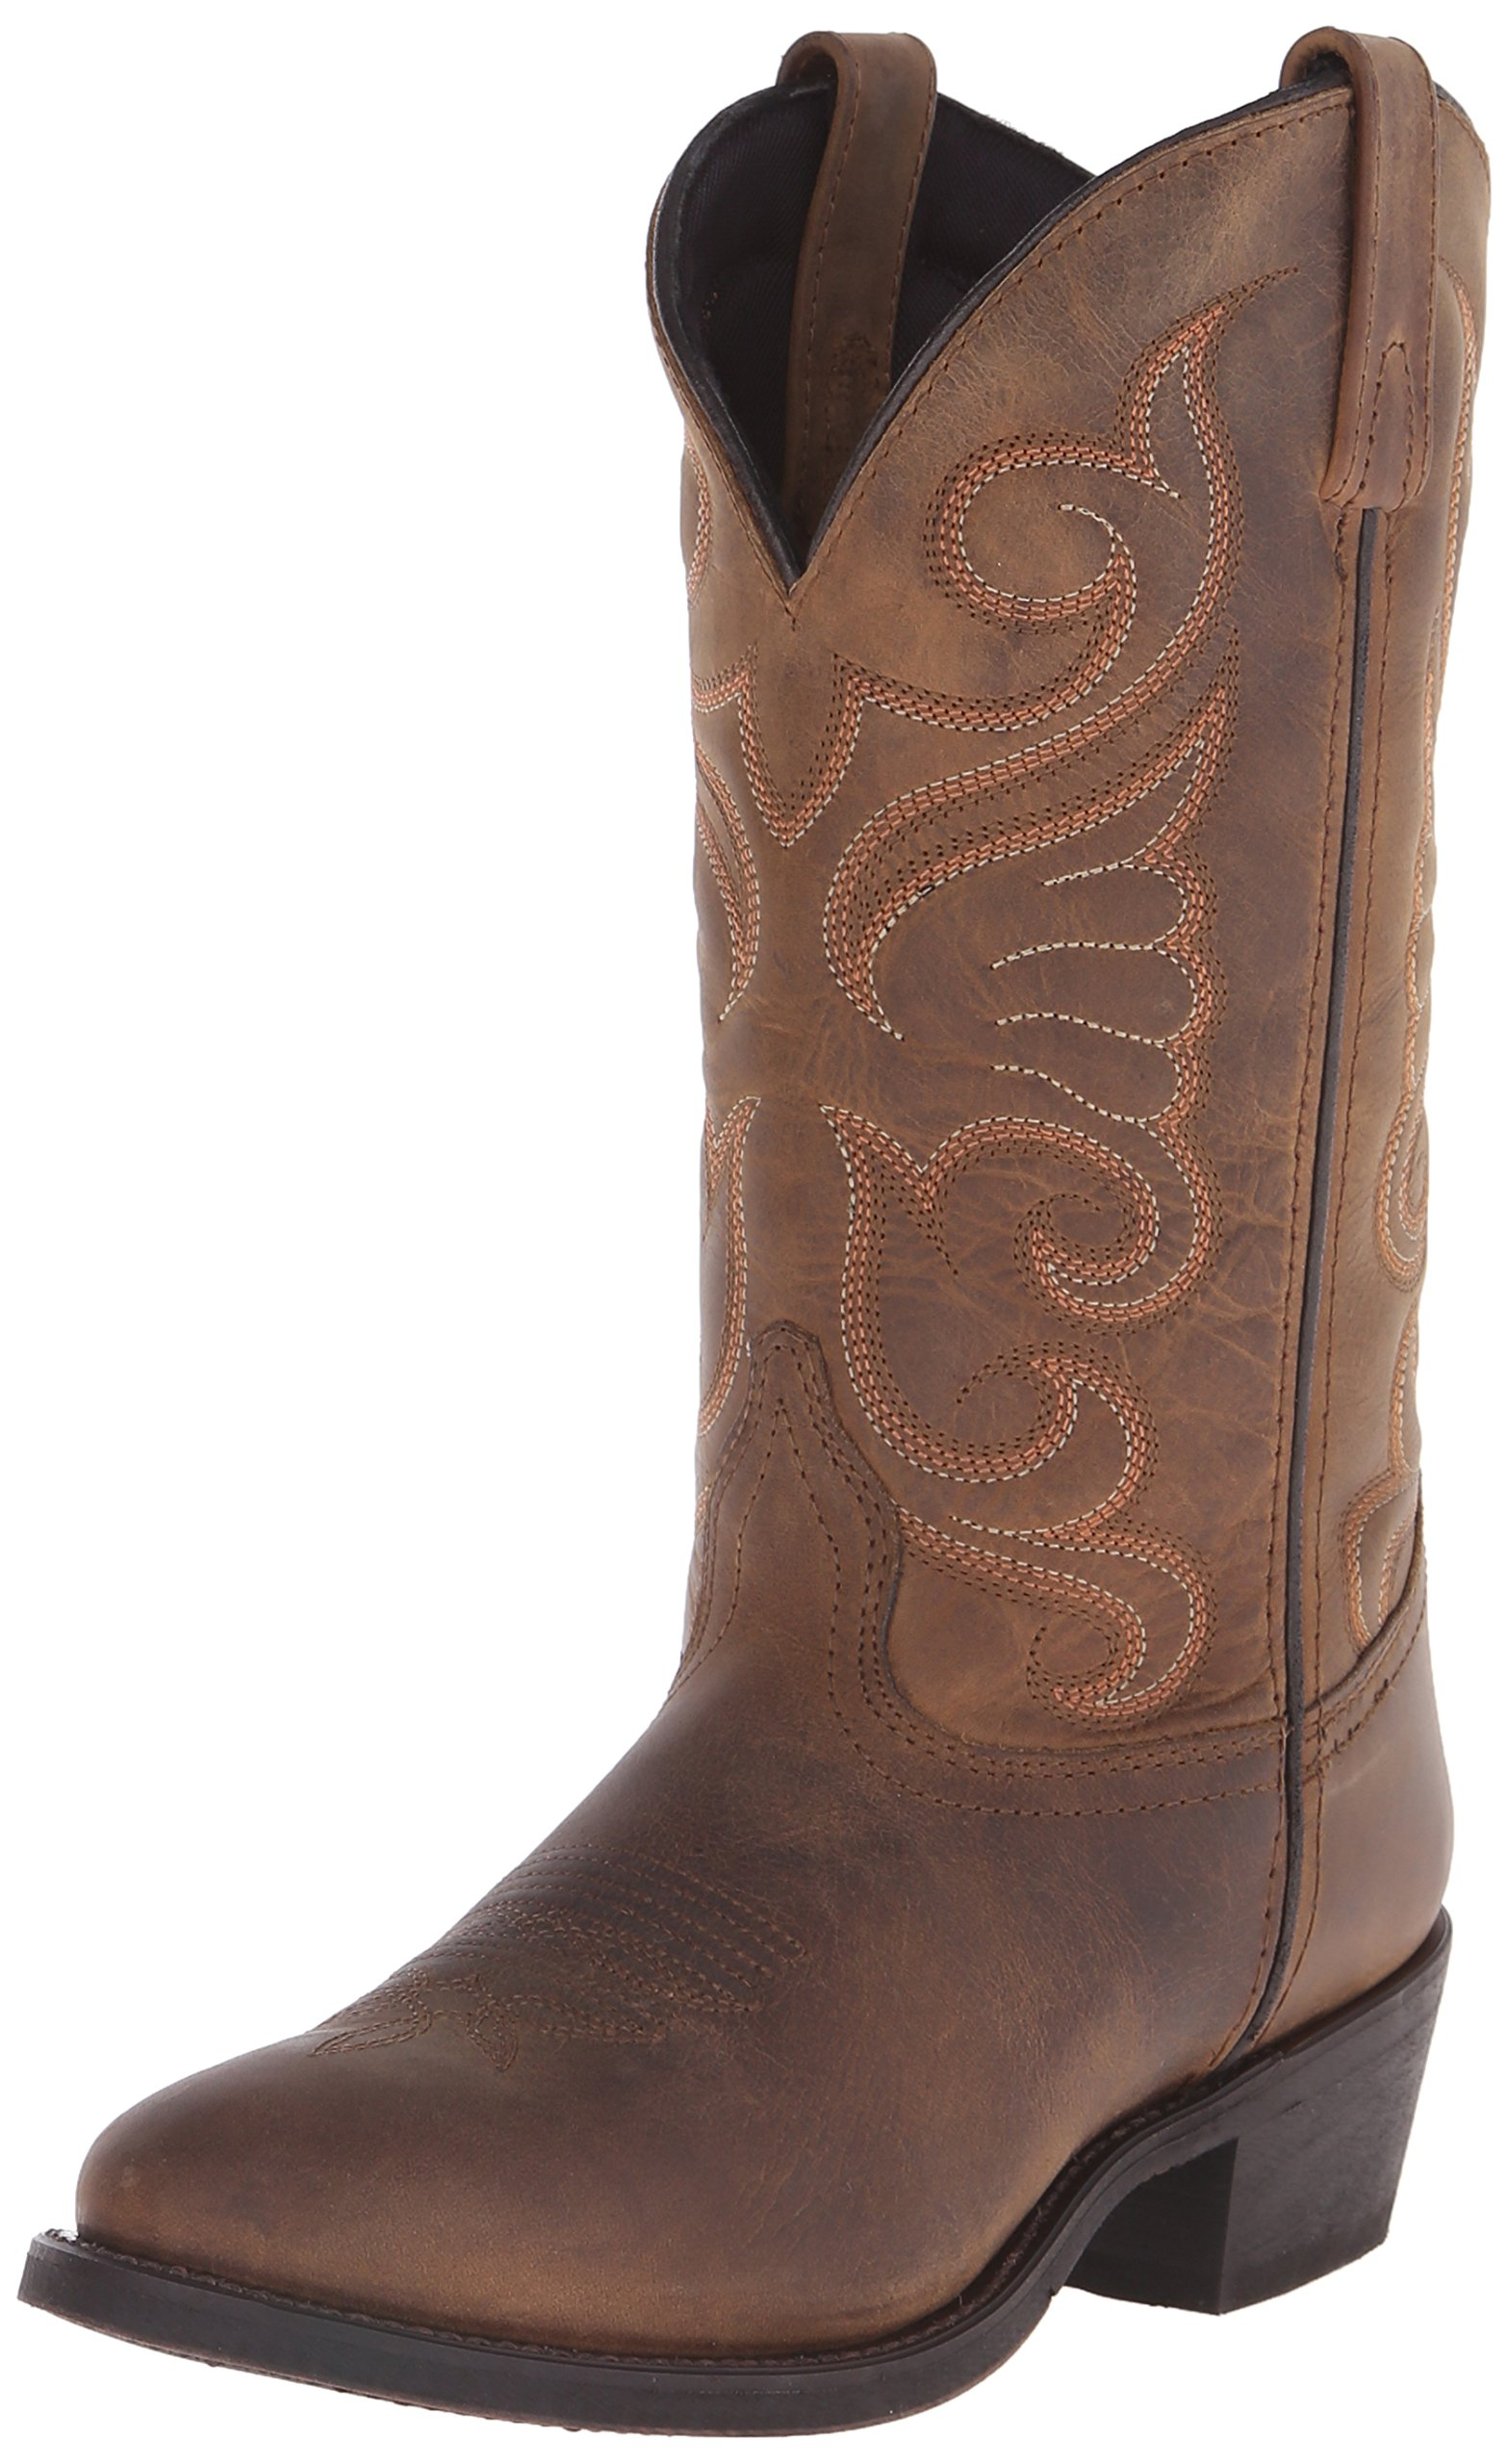 Laredo Women's Bridget Western Boot, Tan, 9 M US